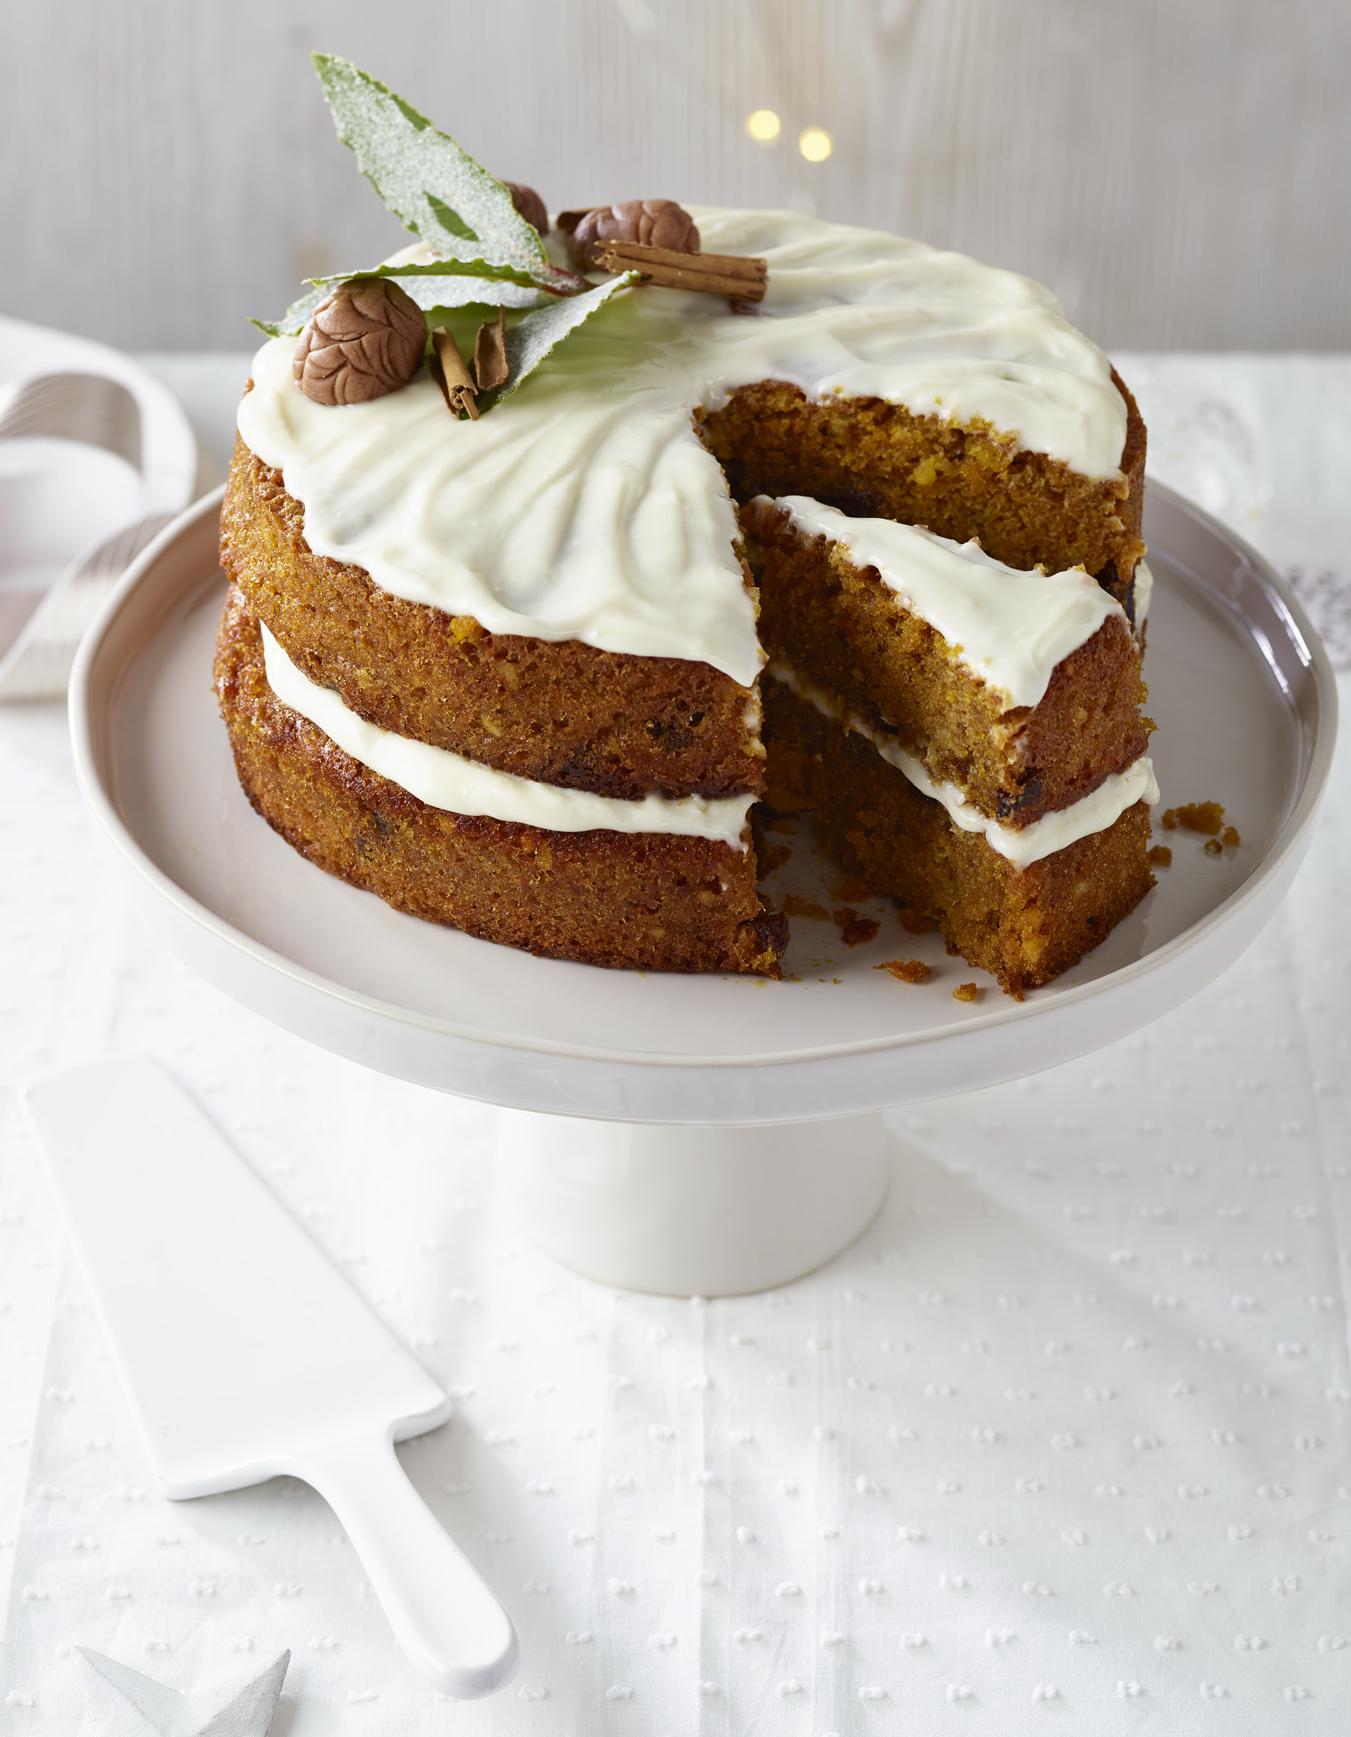 Winter garden carrot and parsnip cake | Recipe | Winter garden ...